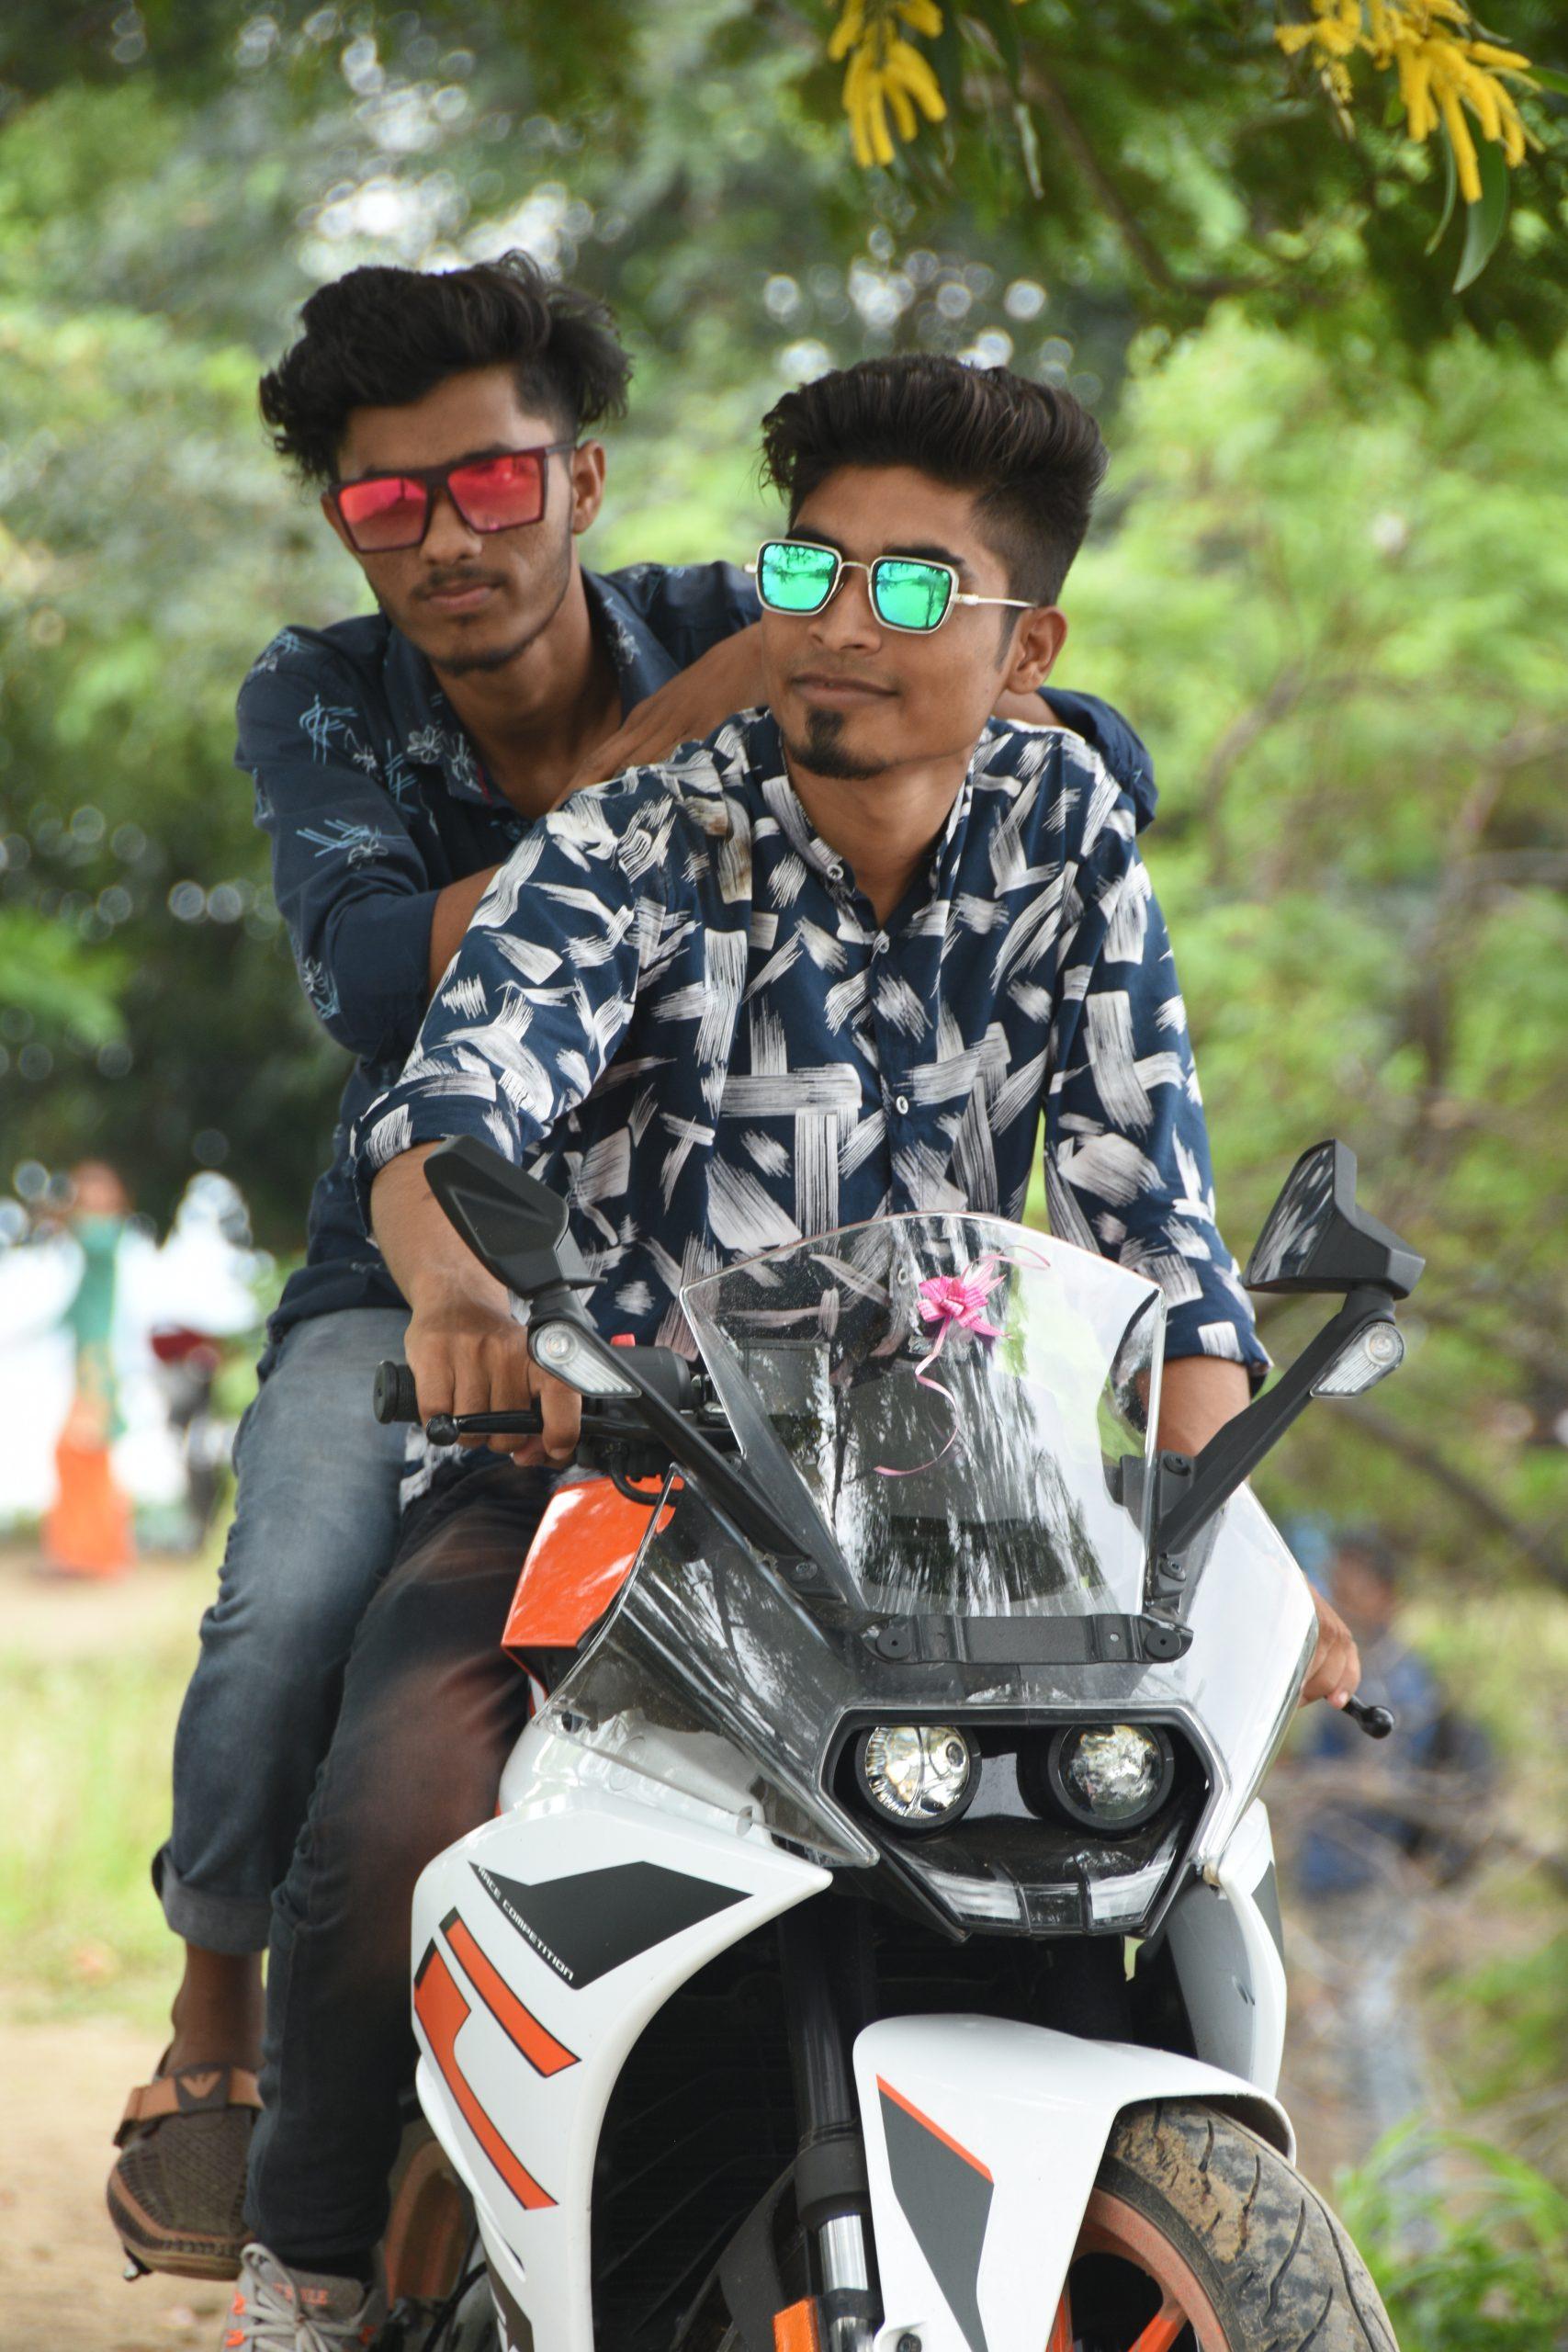 Boys riding on a bike